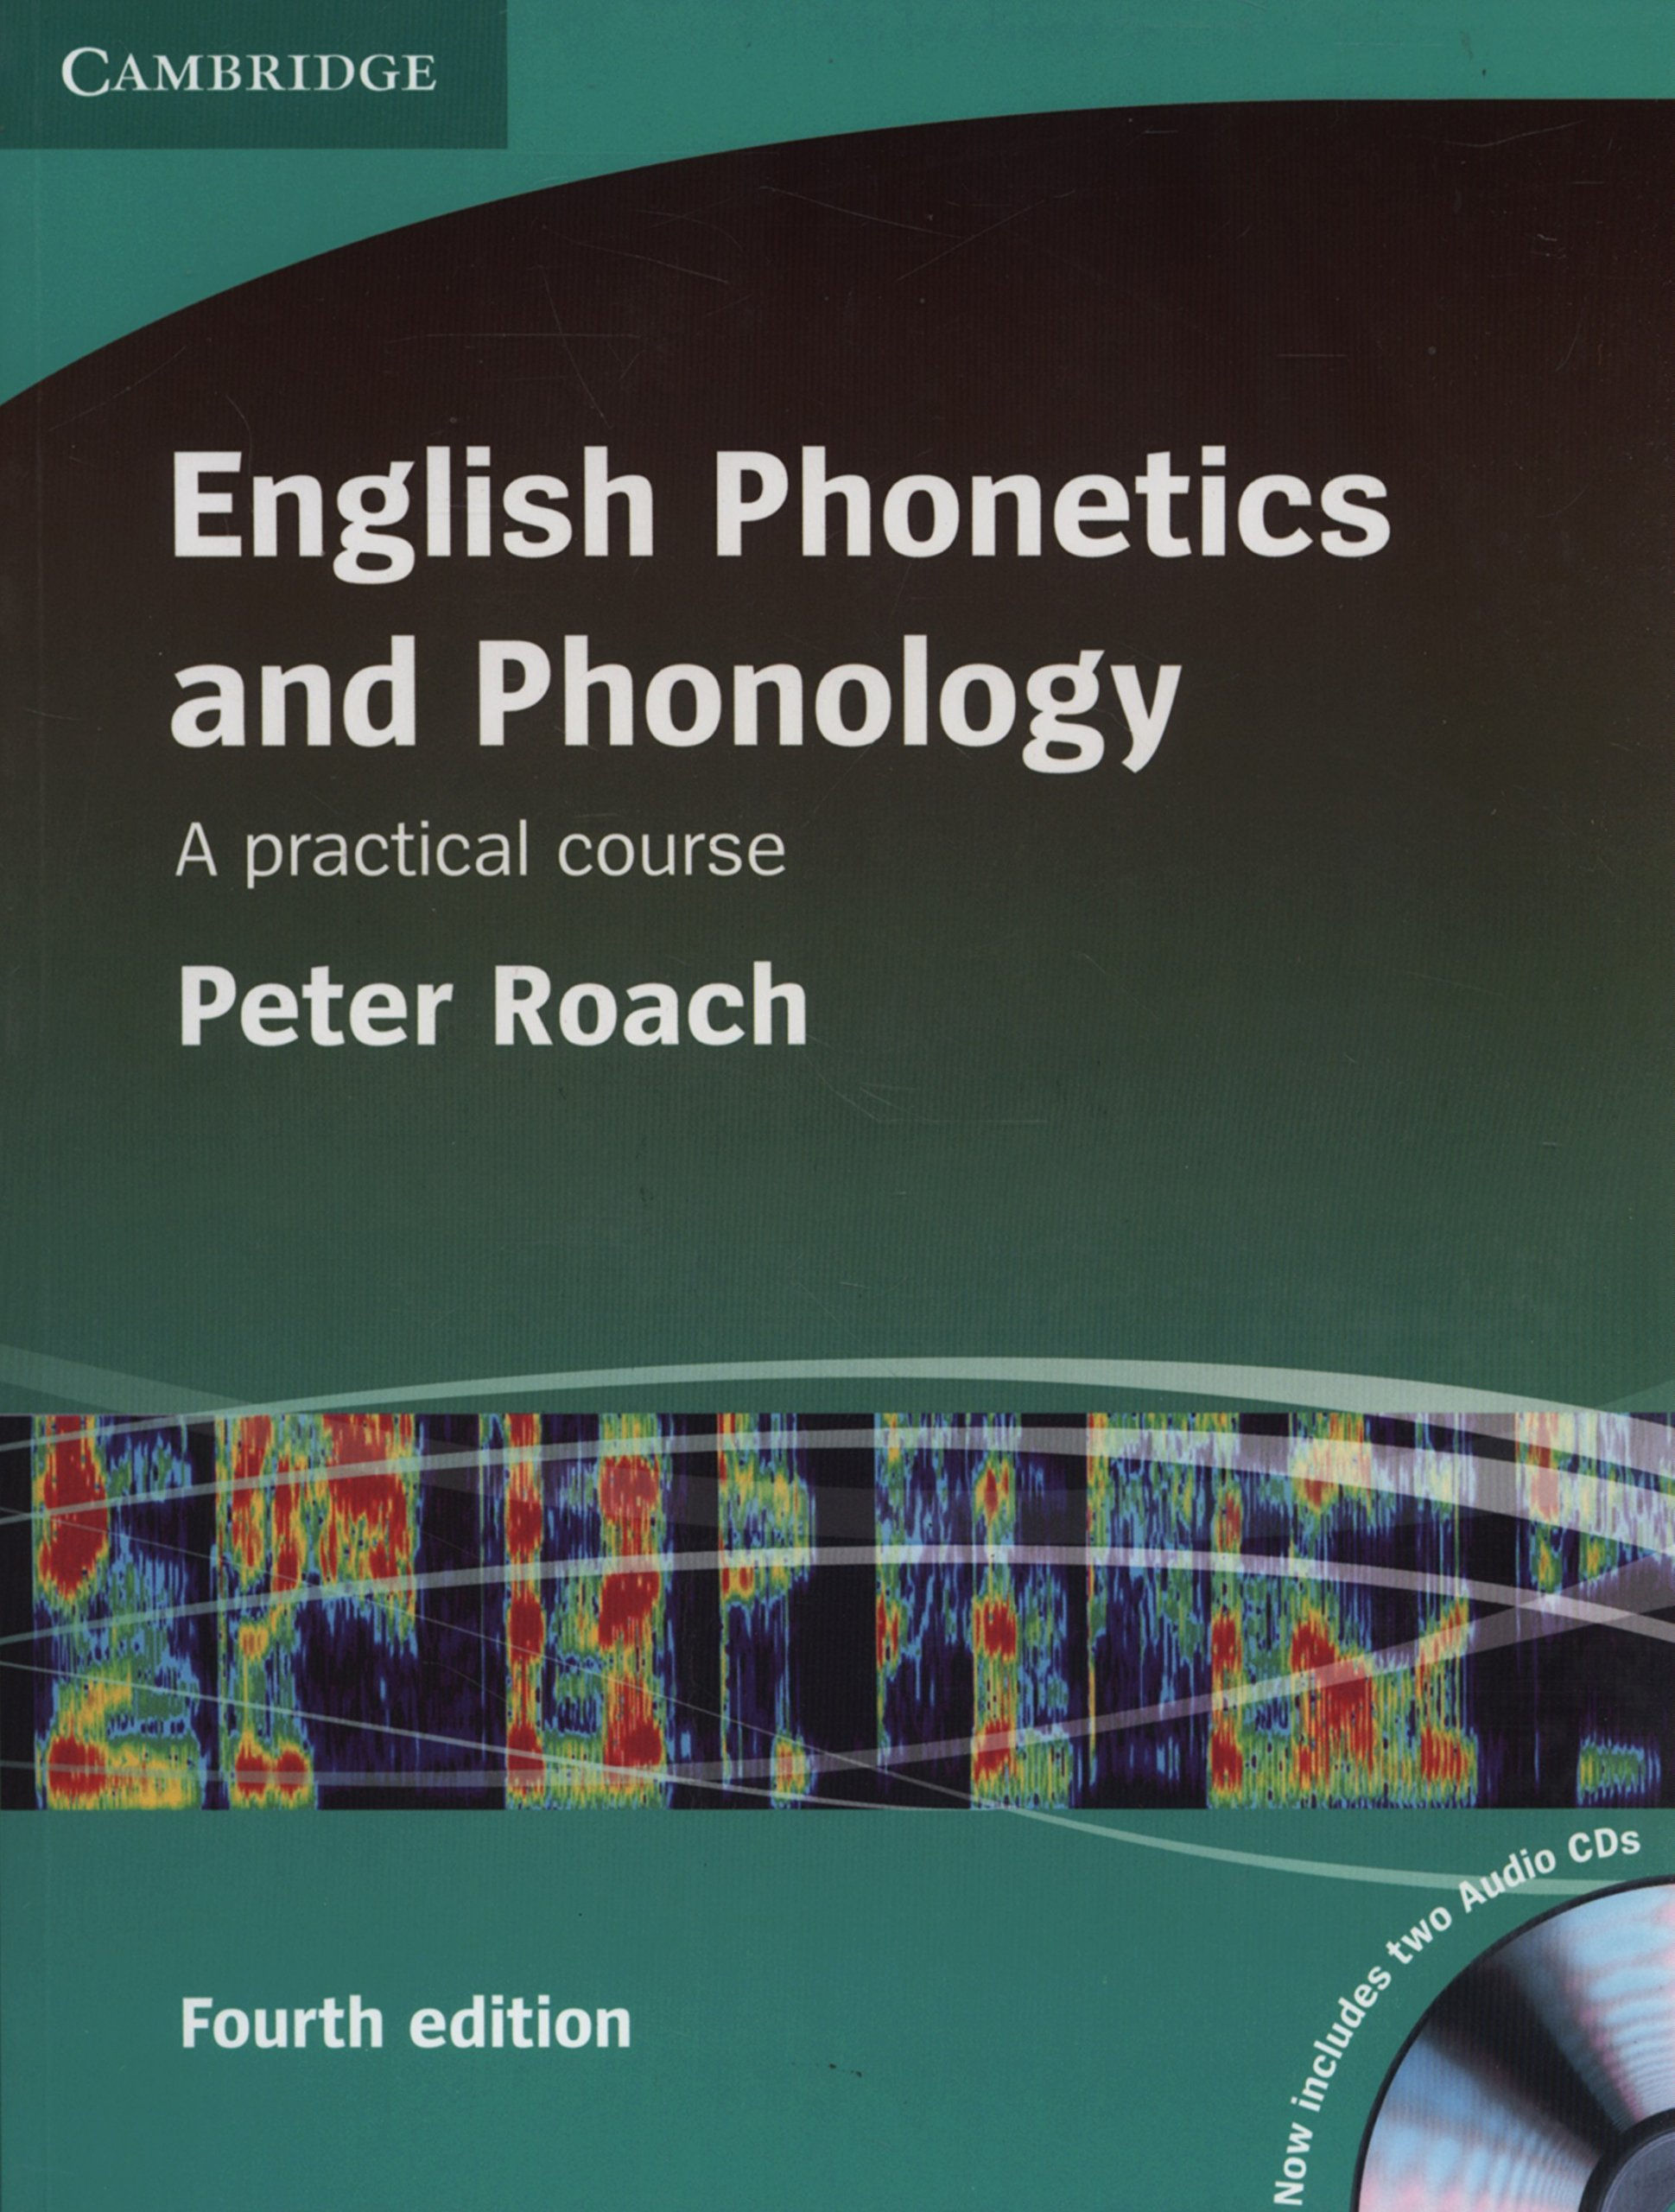 یادگیری تلفظ اصوات انگلیسی و علائم فونتیک / Cambridge University English Phonetics and Phonology Ebook +CD